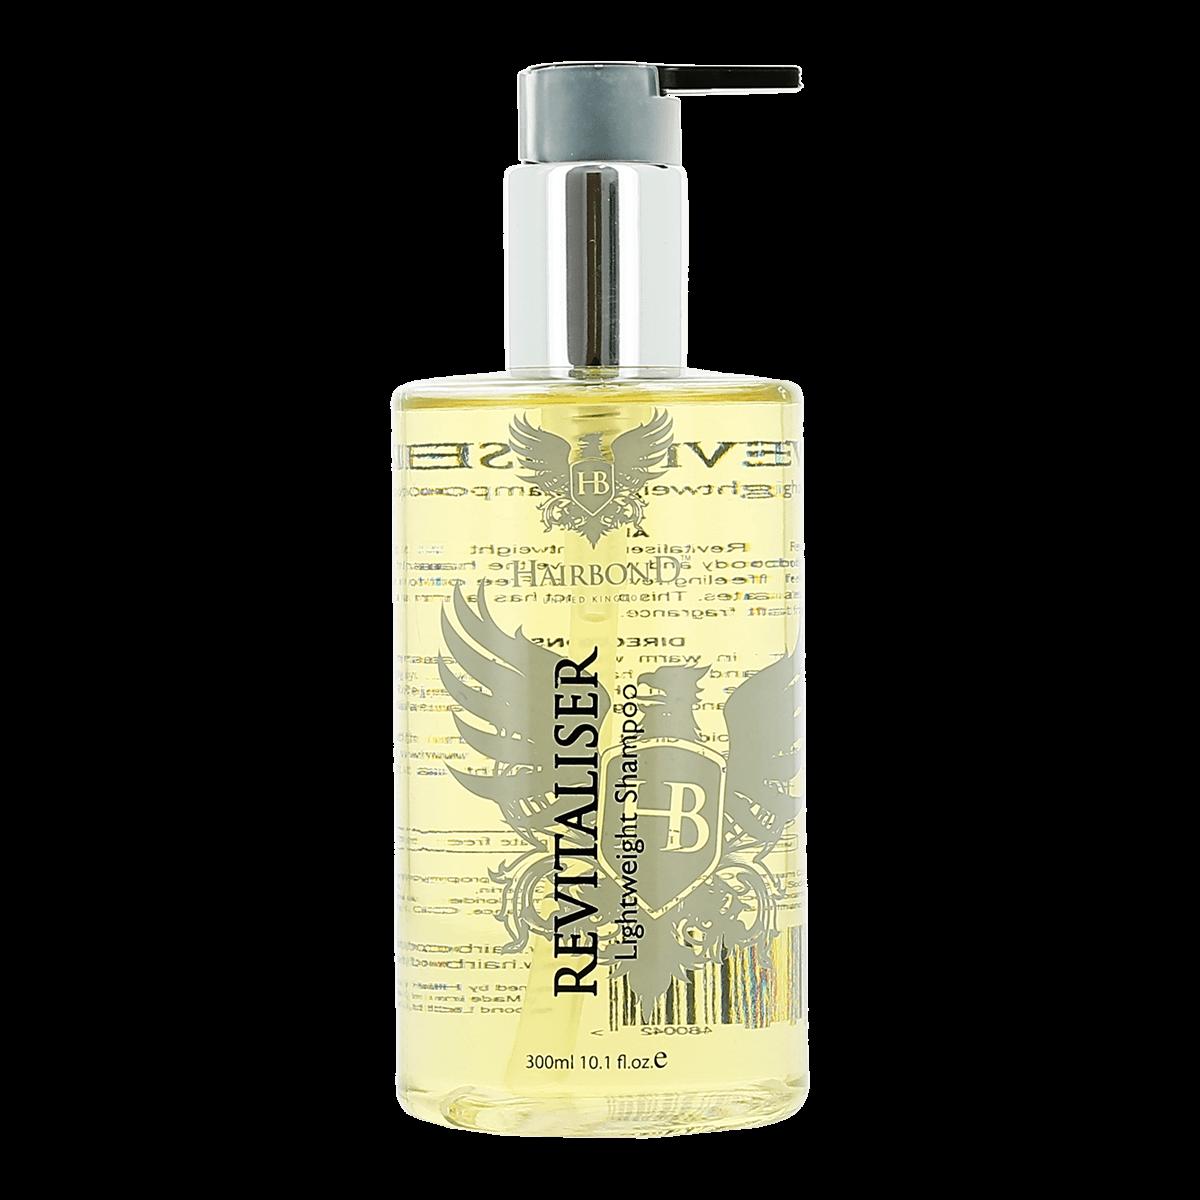 Hairbond® Revitaliser Lightweight Shampoo 300ml